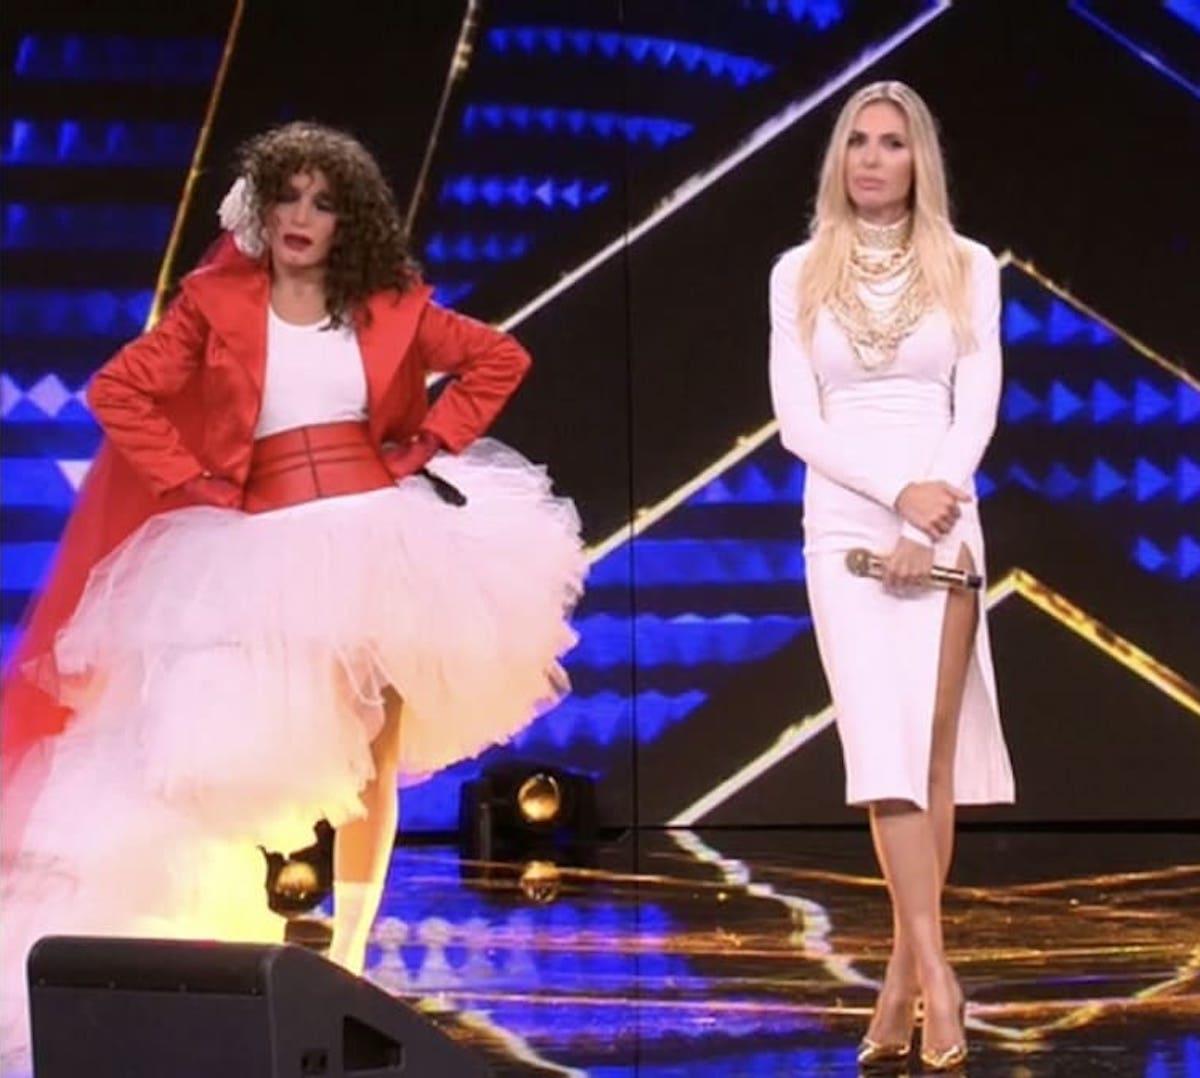 Ilary Blasi star in the star decisione Mediaset